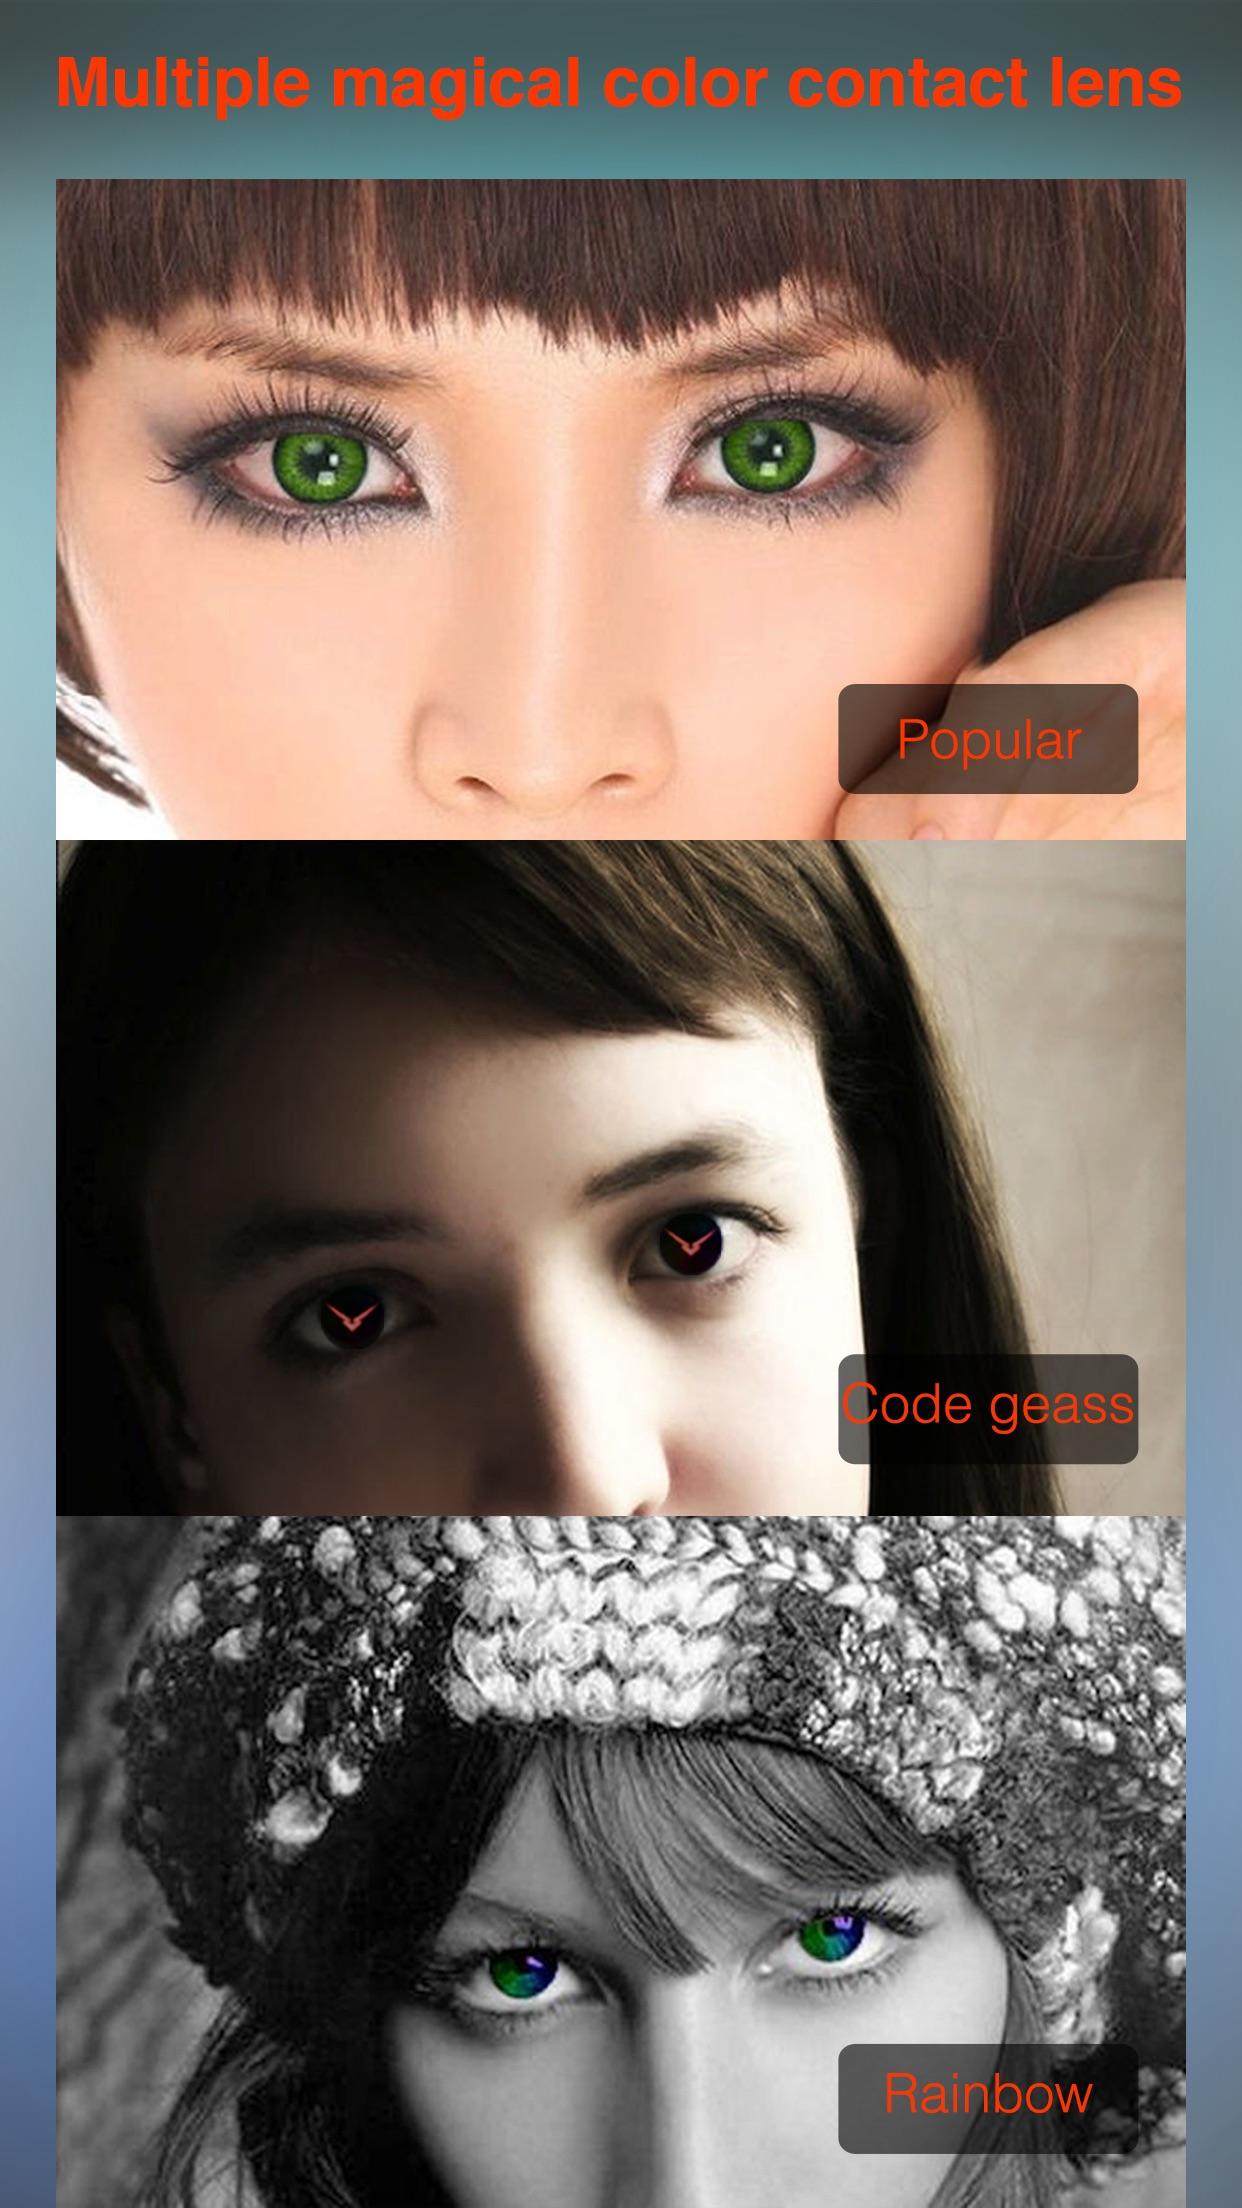 Hot Eye Color Contact Lens - Red Eye Remover Screenshot